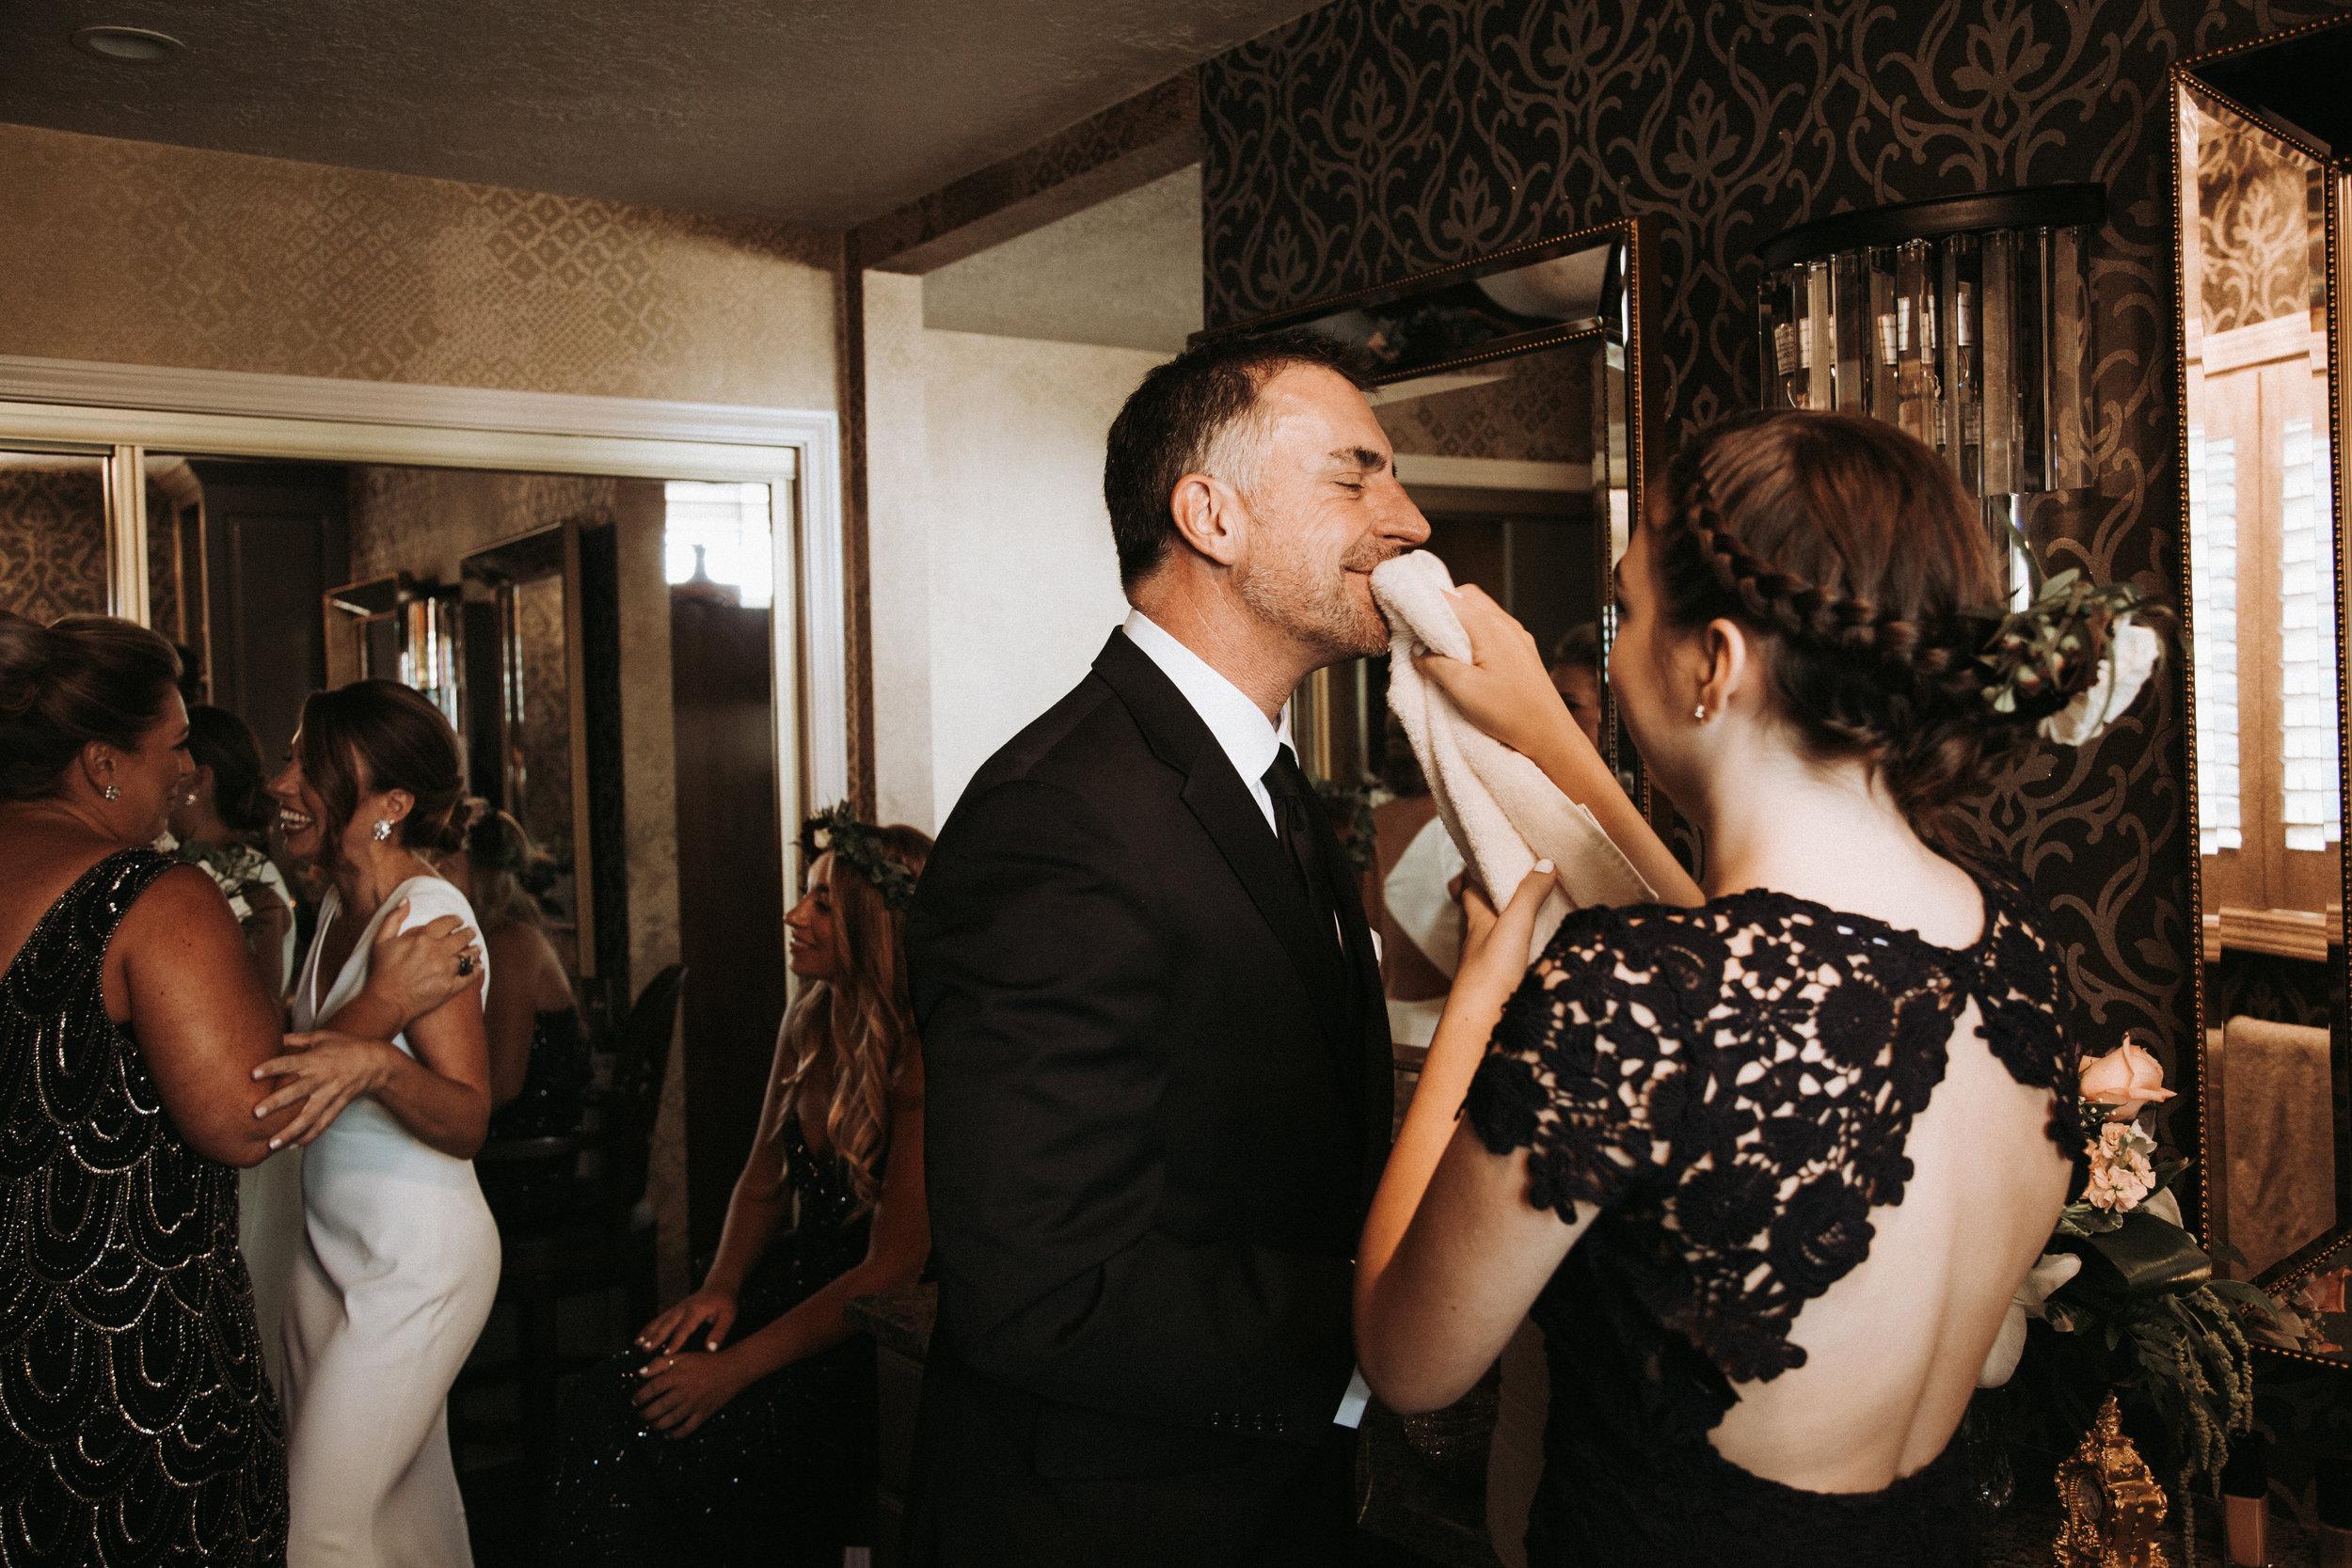 PORTLAND INTIMATE BACKYARD WEDDING_JENNY CHOKBENGBOUN PHOTO-202.JPG